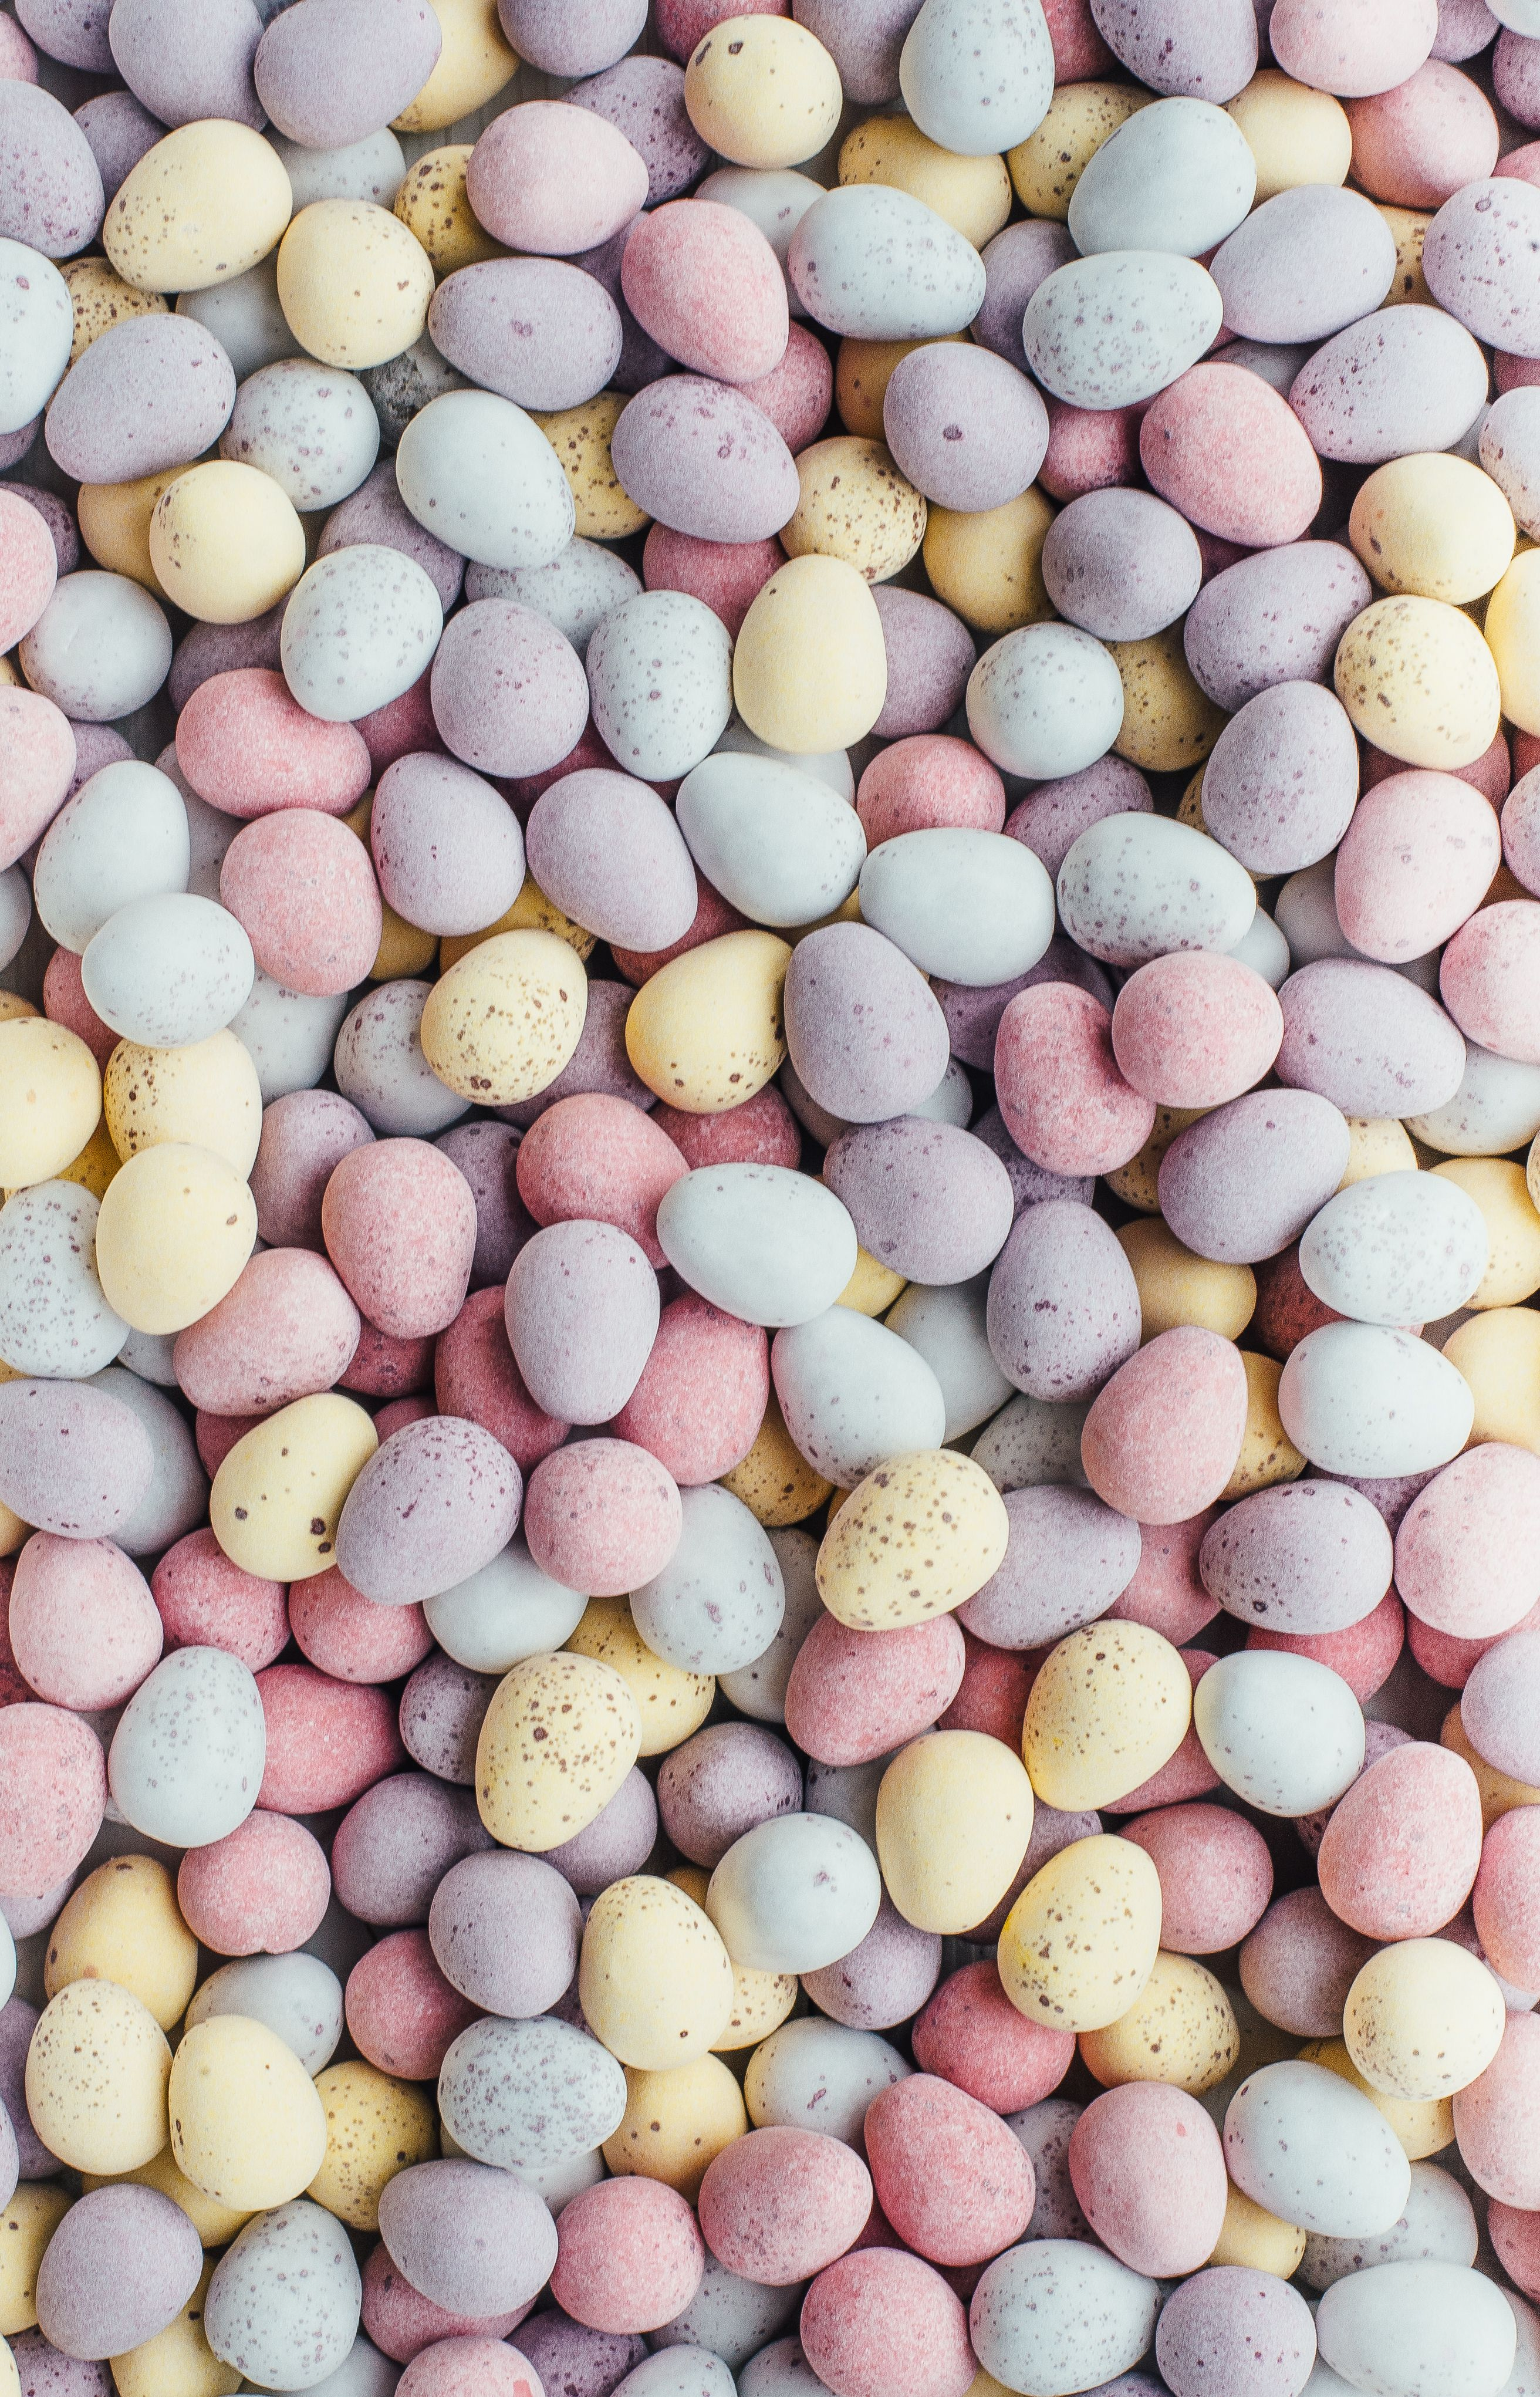 Easter Eggs.Annie Spratt. choc, chocolate, Easter, eggs